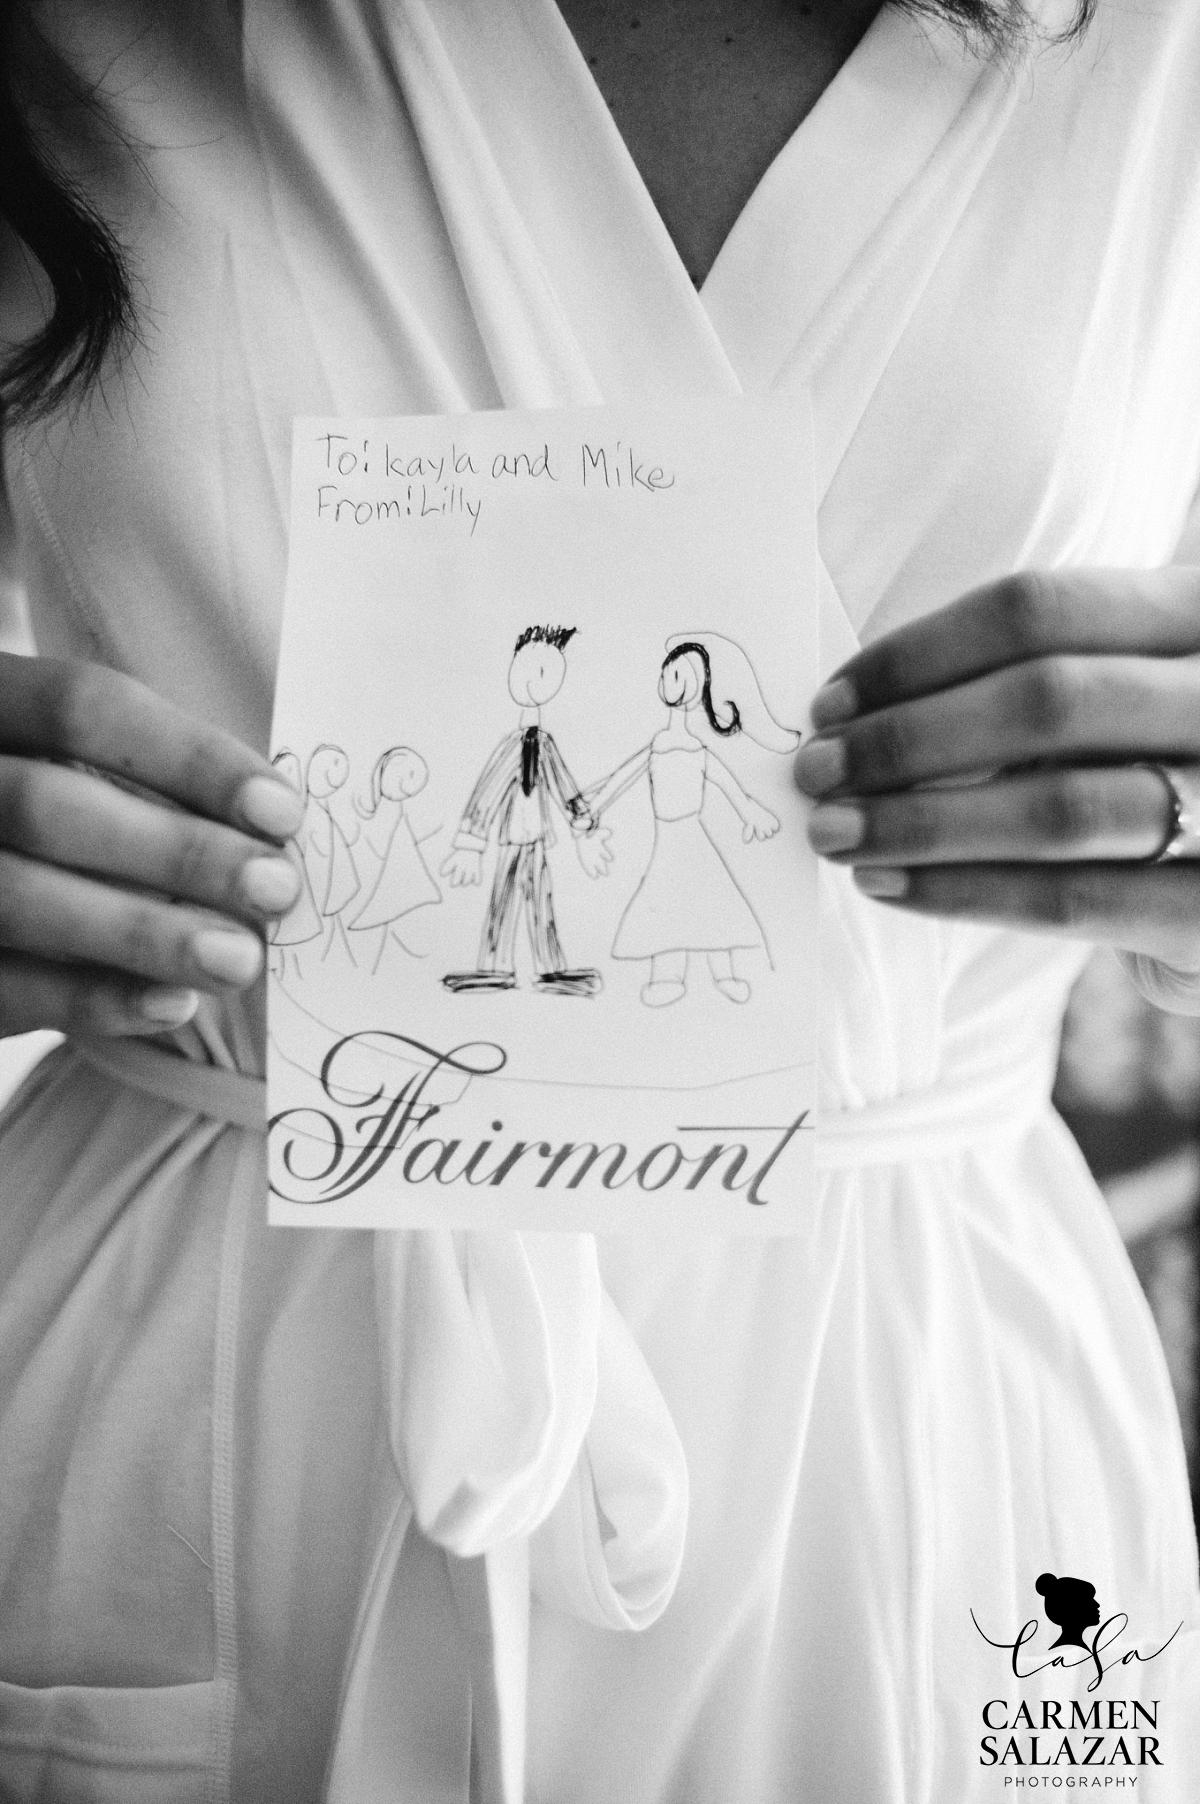 Adorable wedding day note from niece - Carmen Salazar